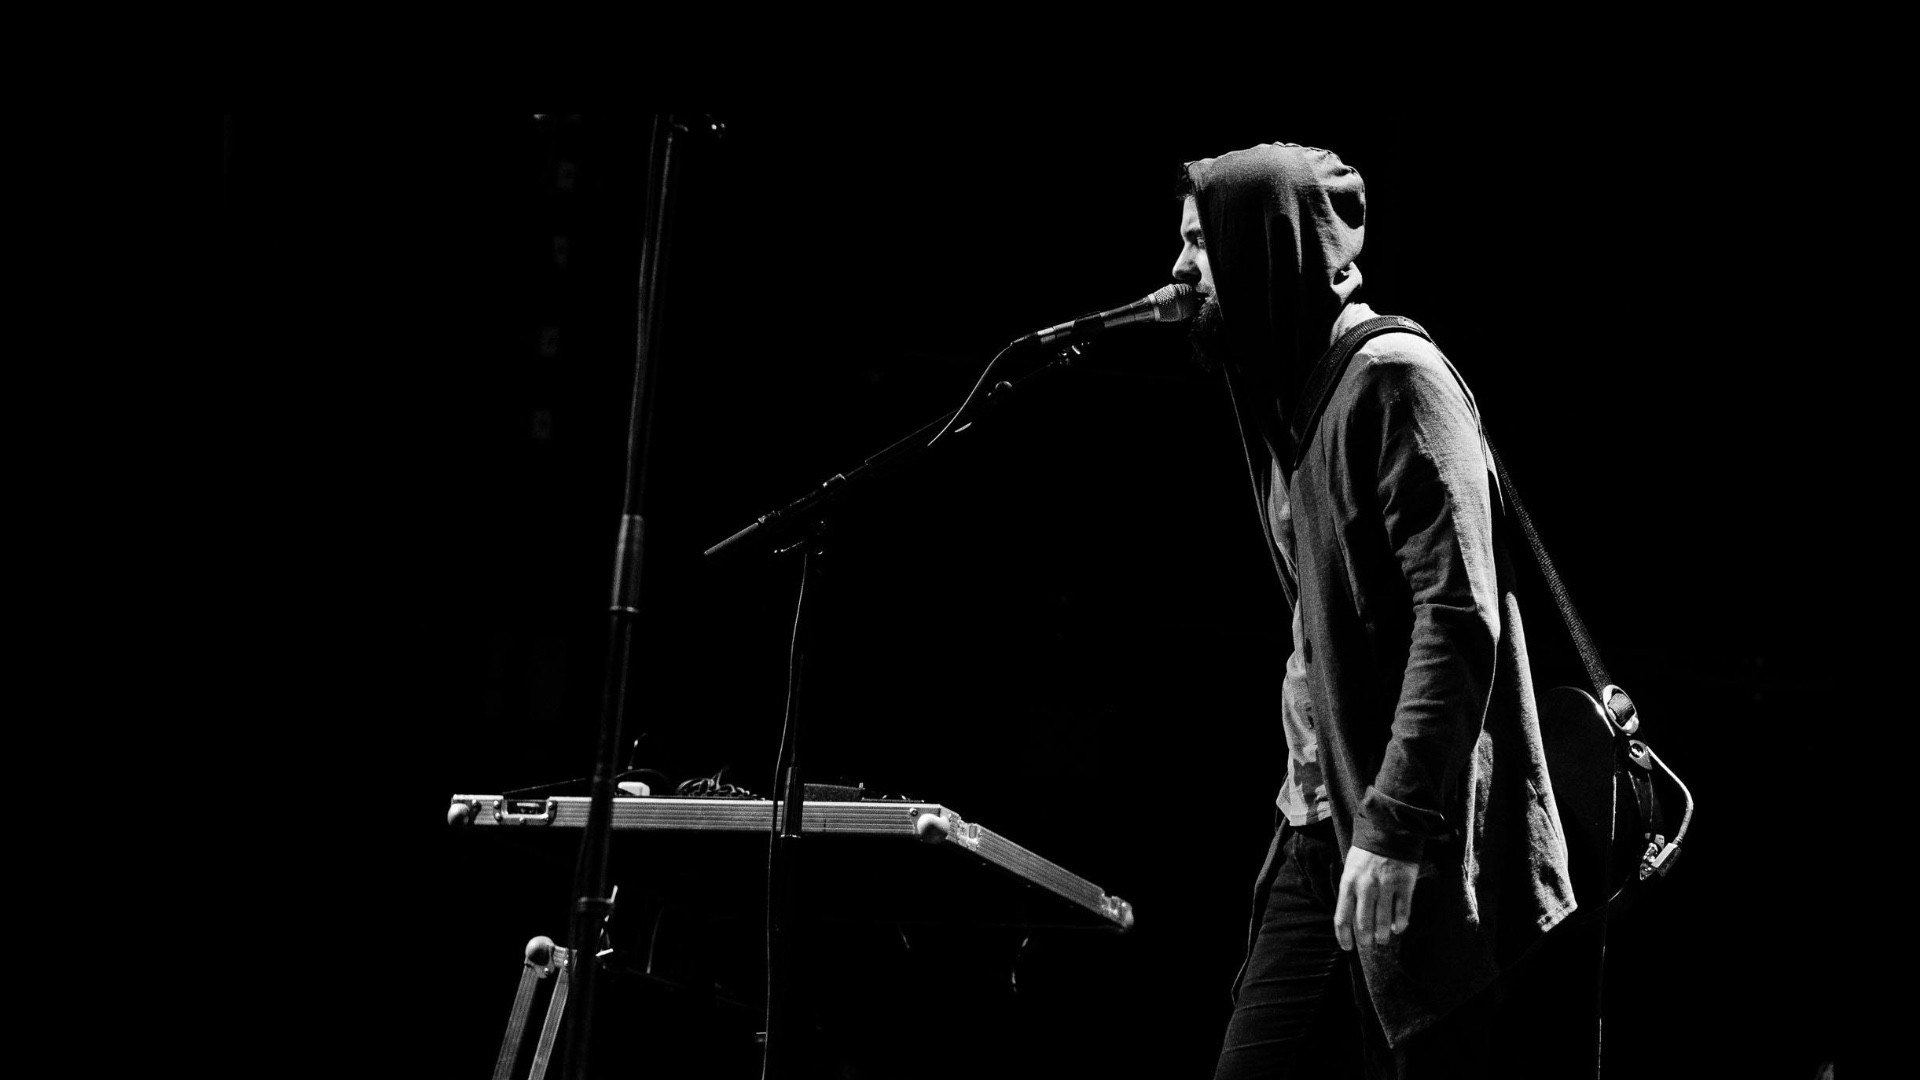 Photo by Matej Celar / M3 Photography